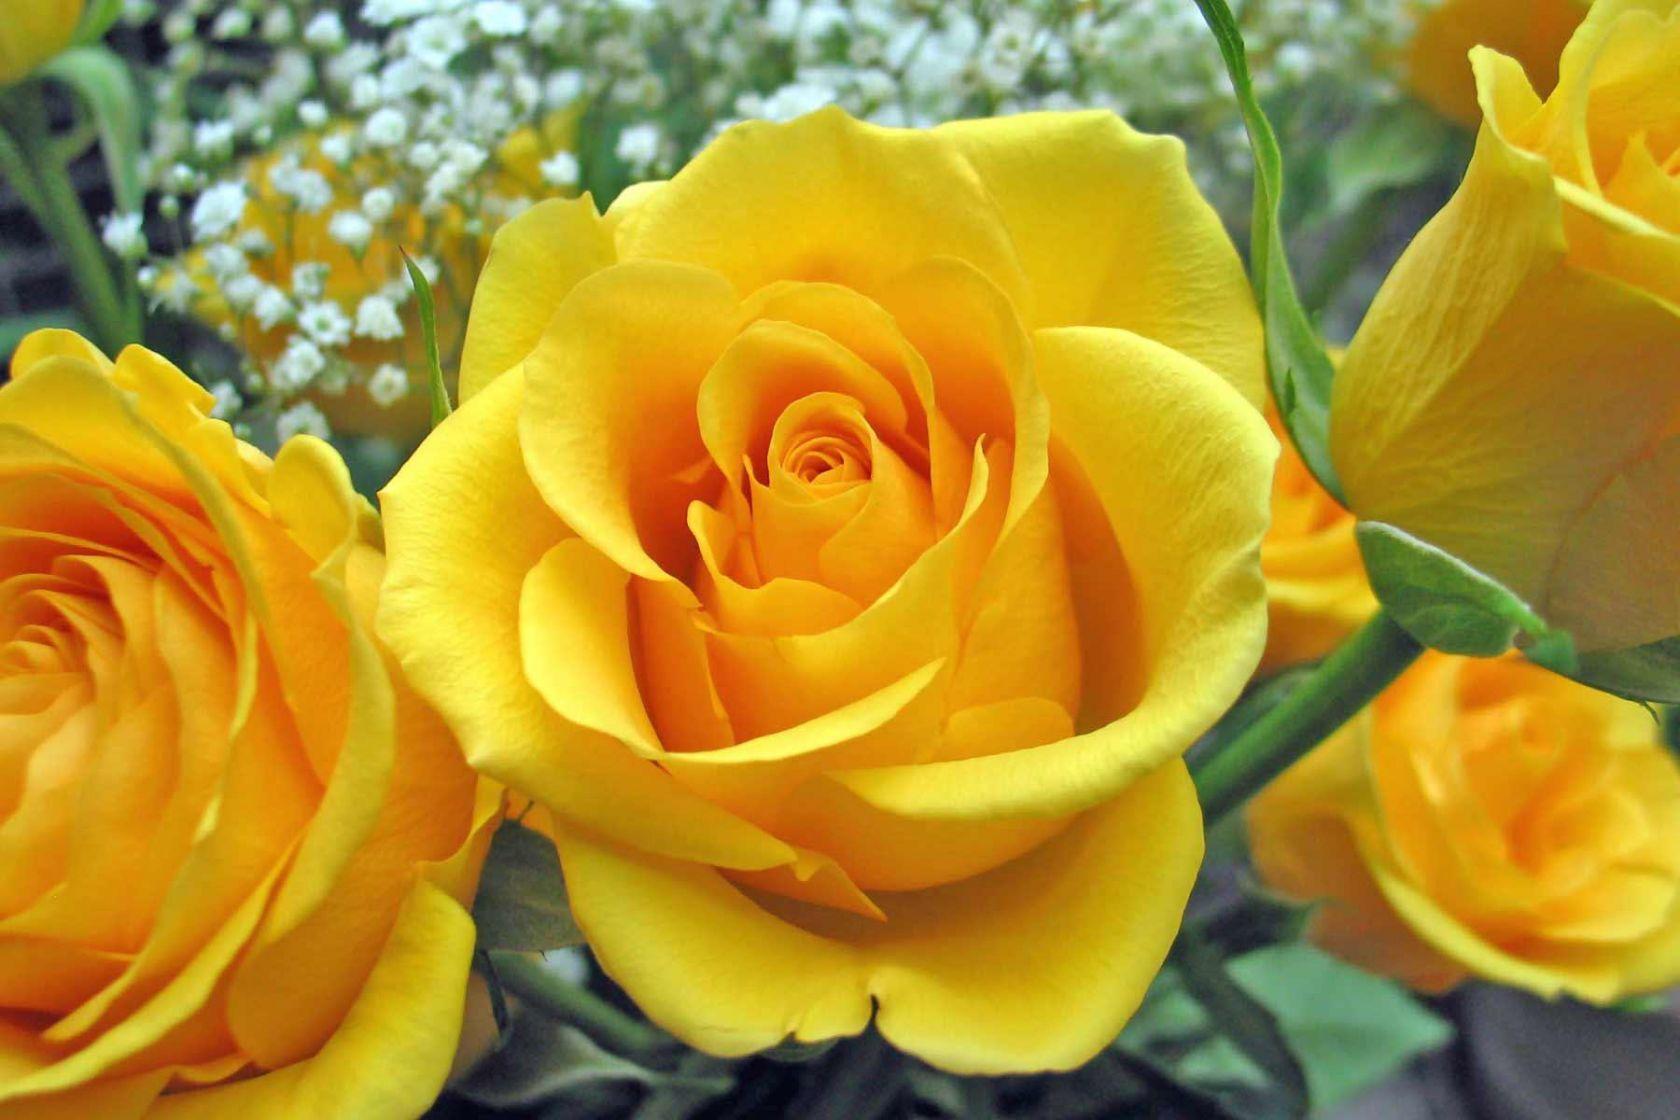 rosa-amarela_2518_1680x1050